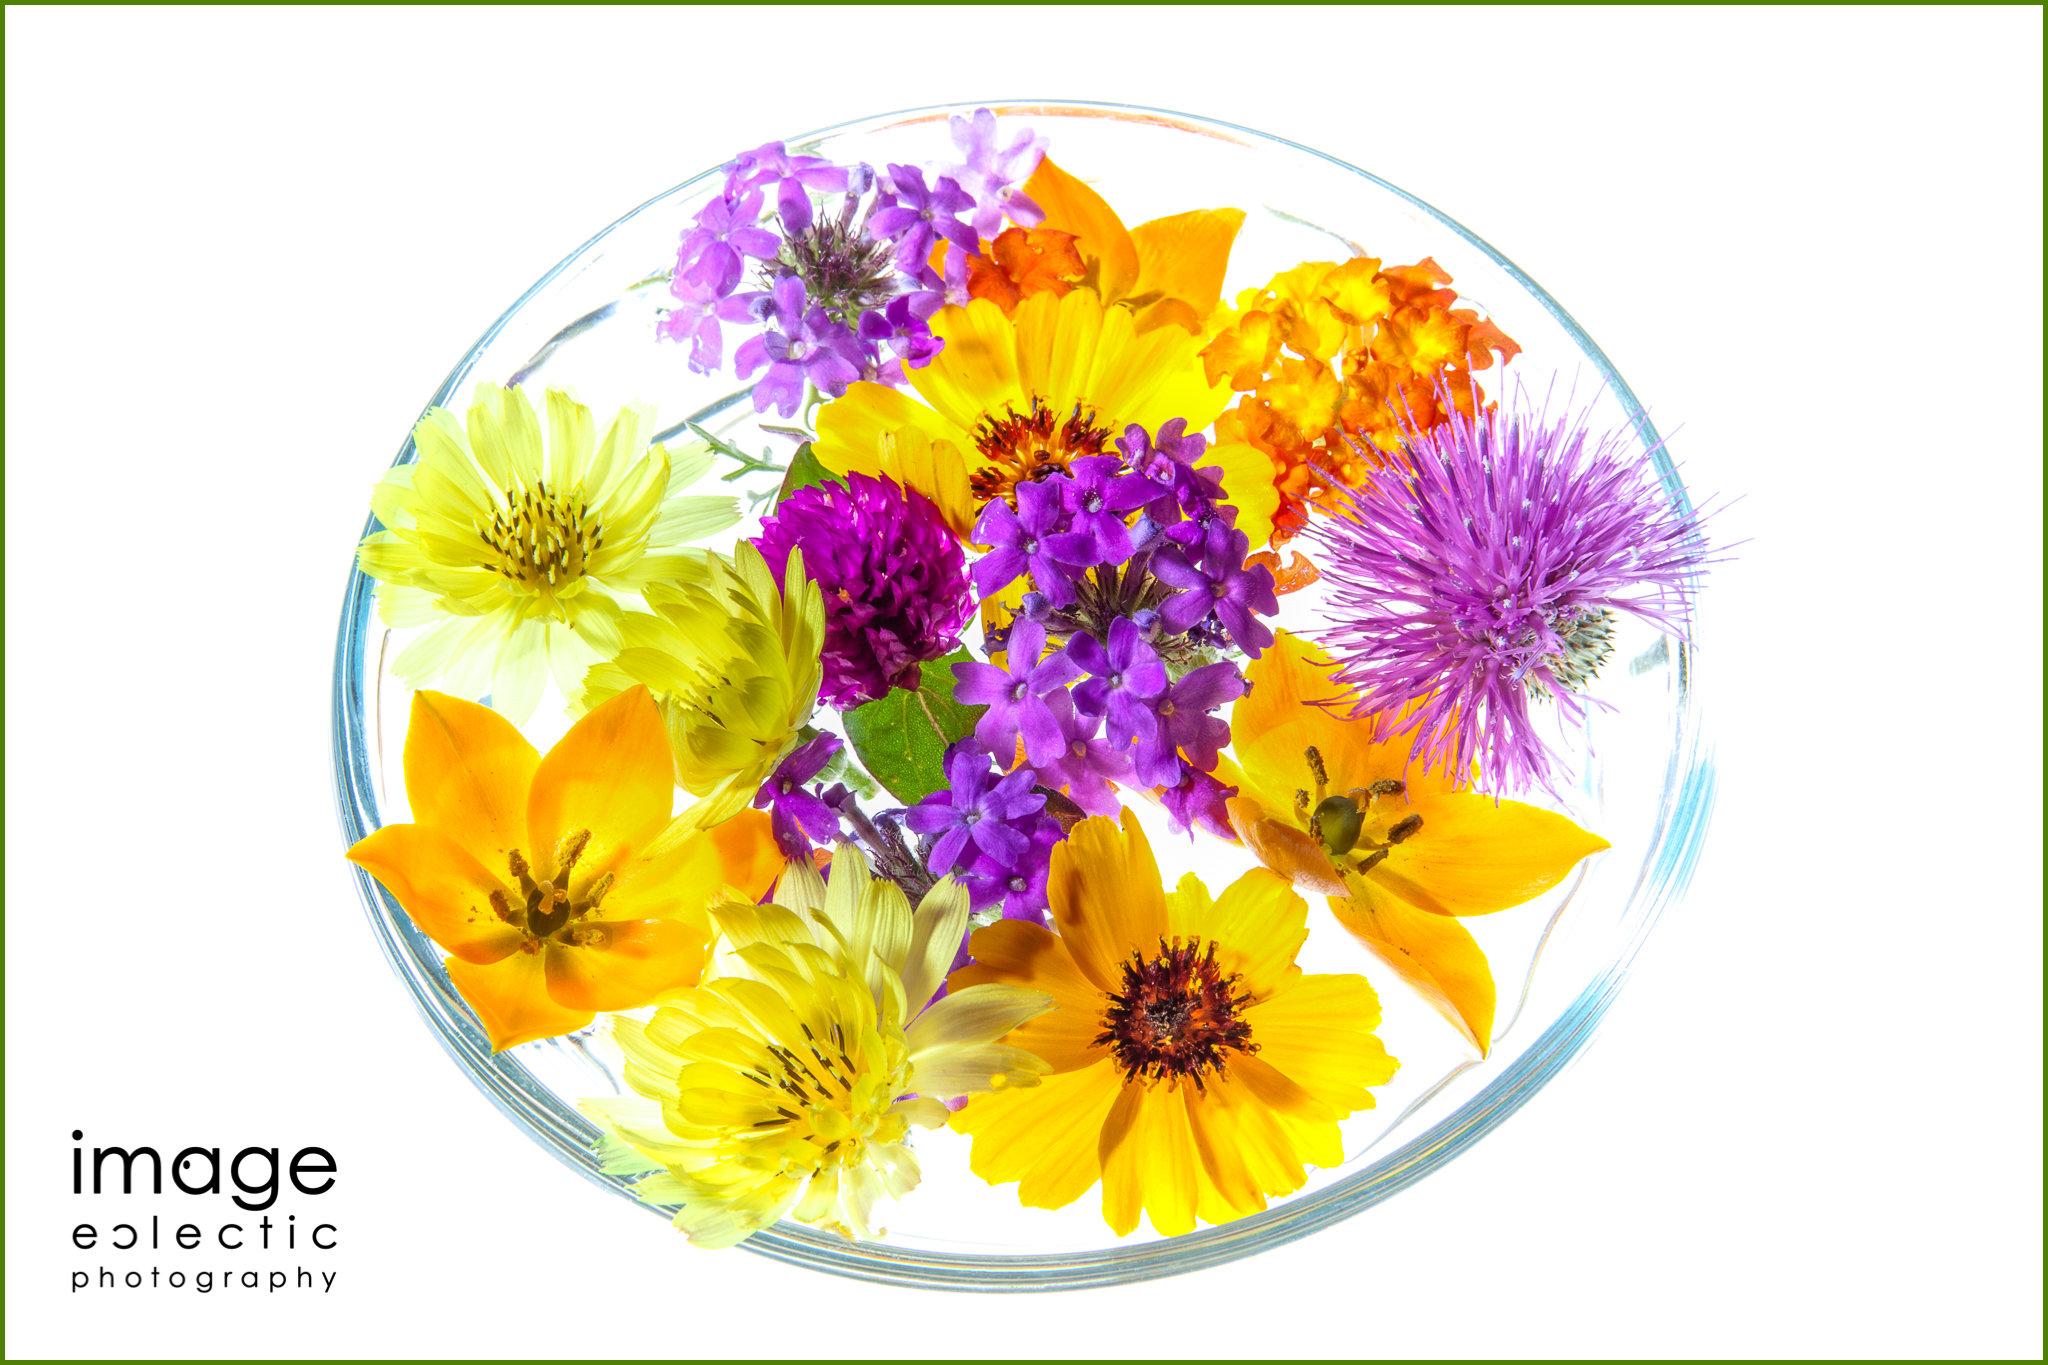 Flowers & Bowl